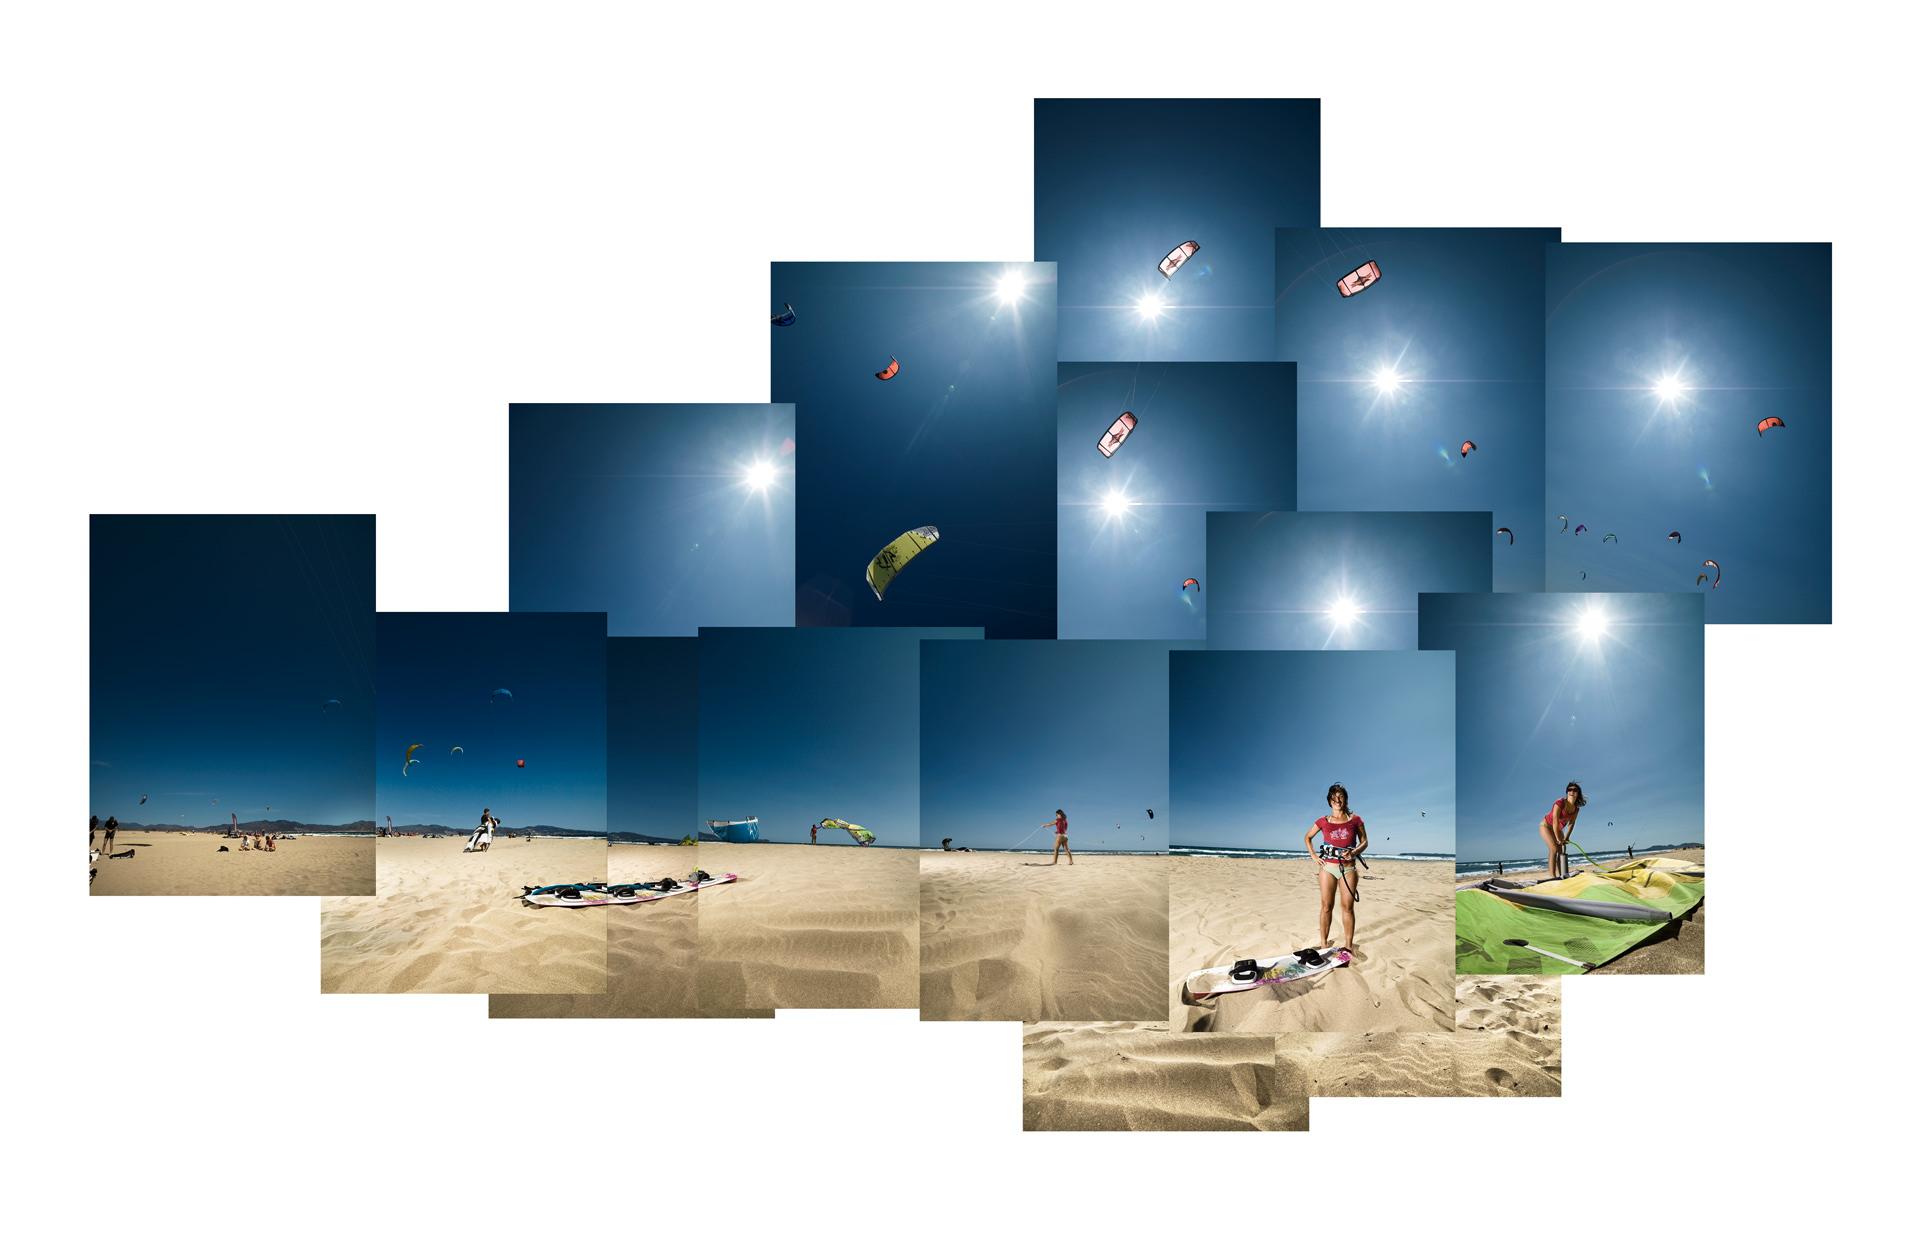 ©ankeluckmann646, ADAC, Reisemagazin, beach, spain, costa brava, people, landscape